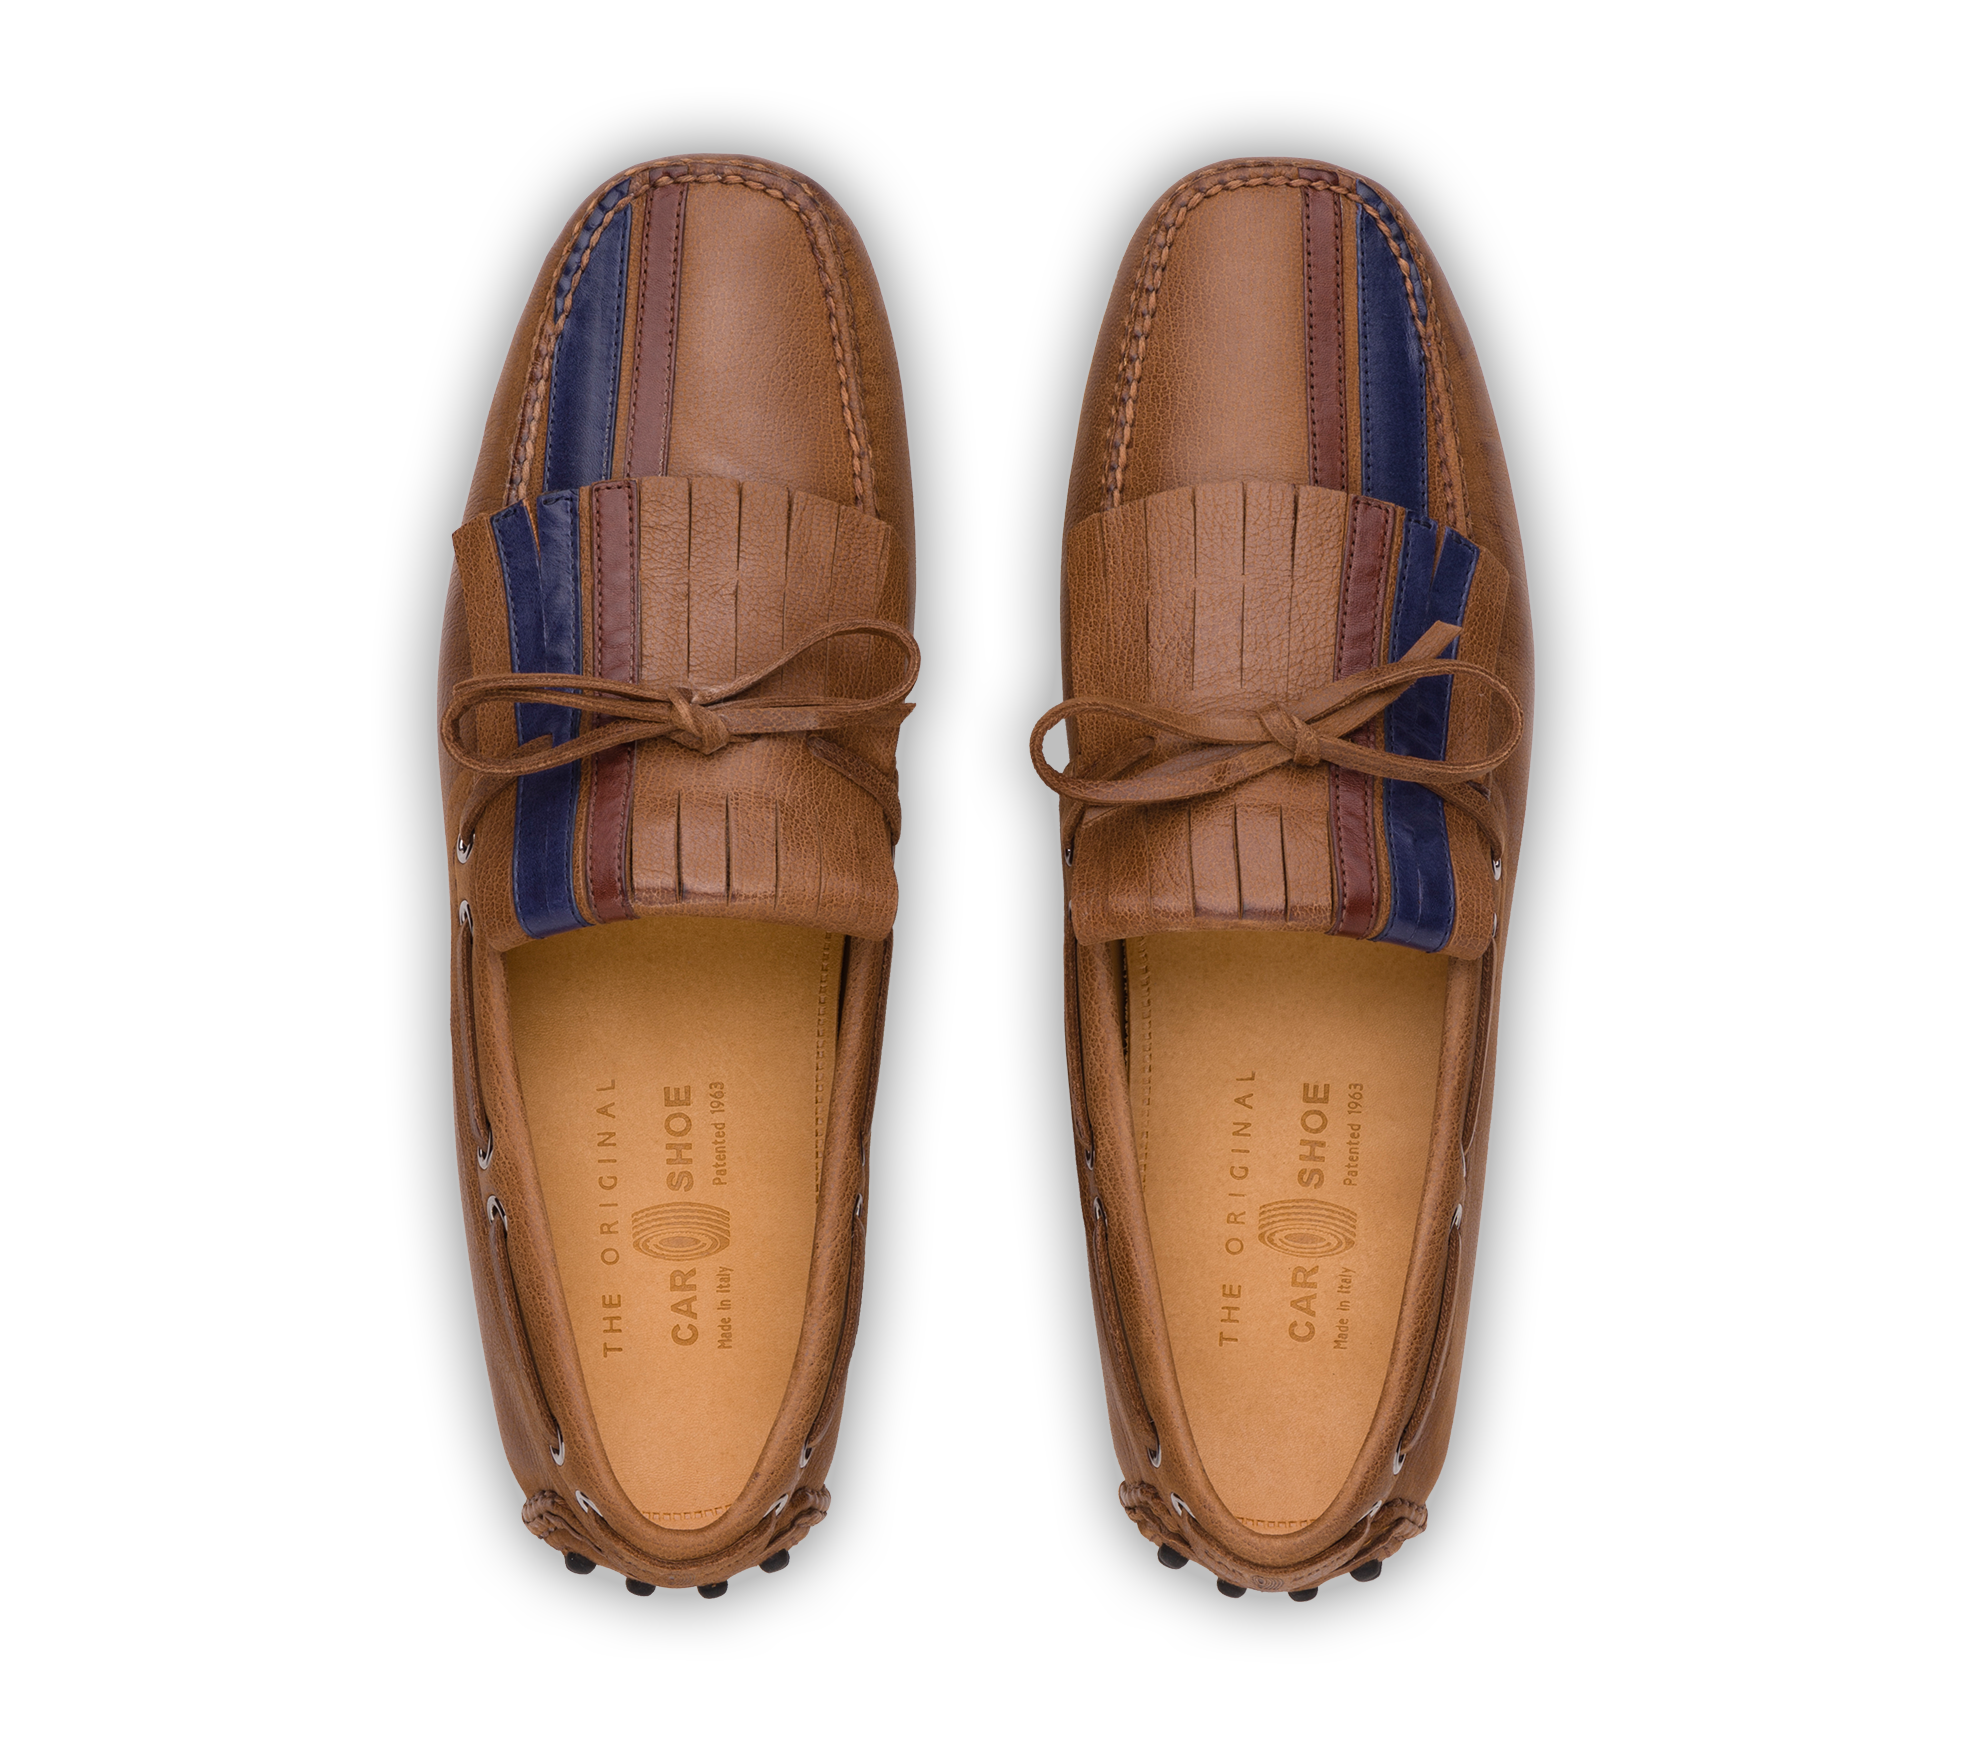 8b49d9af26a7e driving shoes antiqued goat leather Car Shoe, Driving Shoes, Men's Shoes,  Dress Shoes